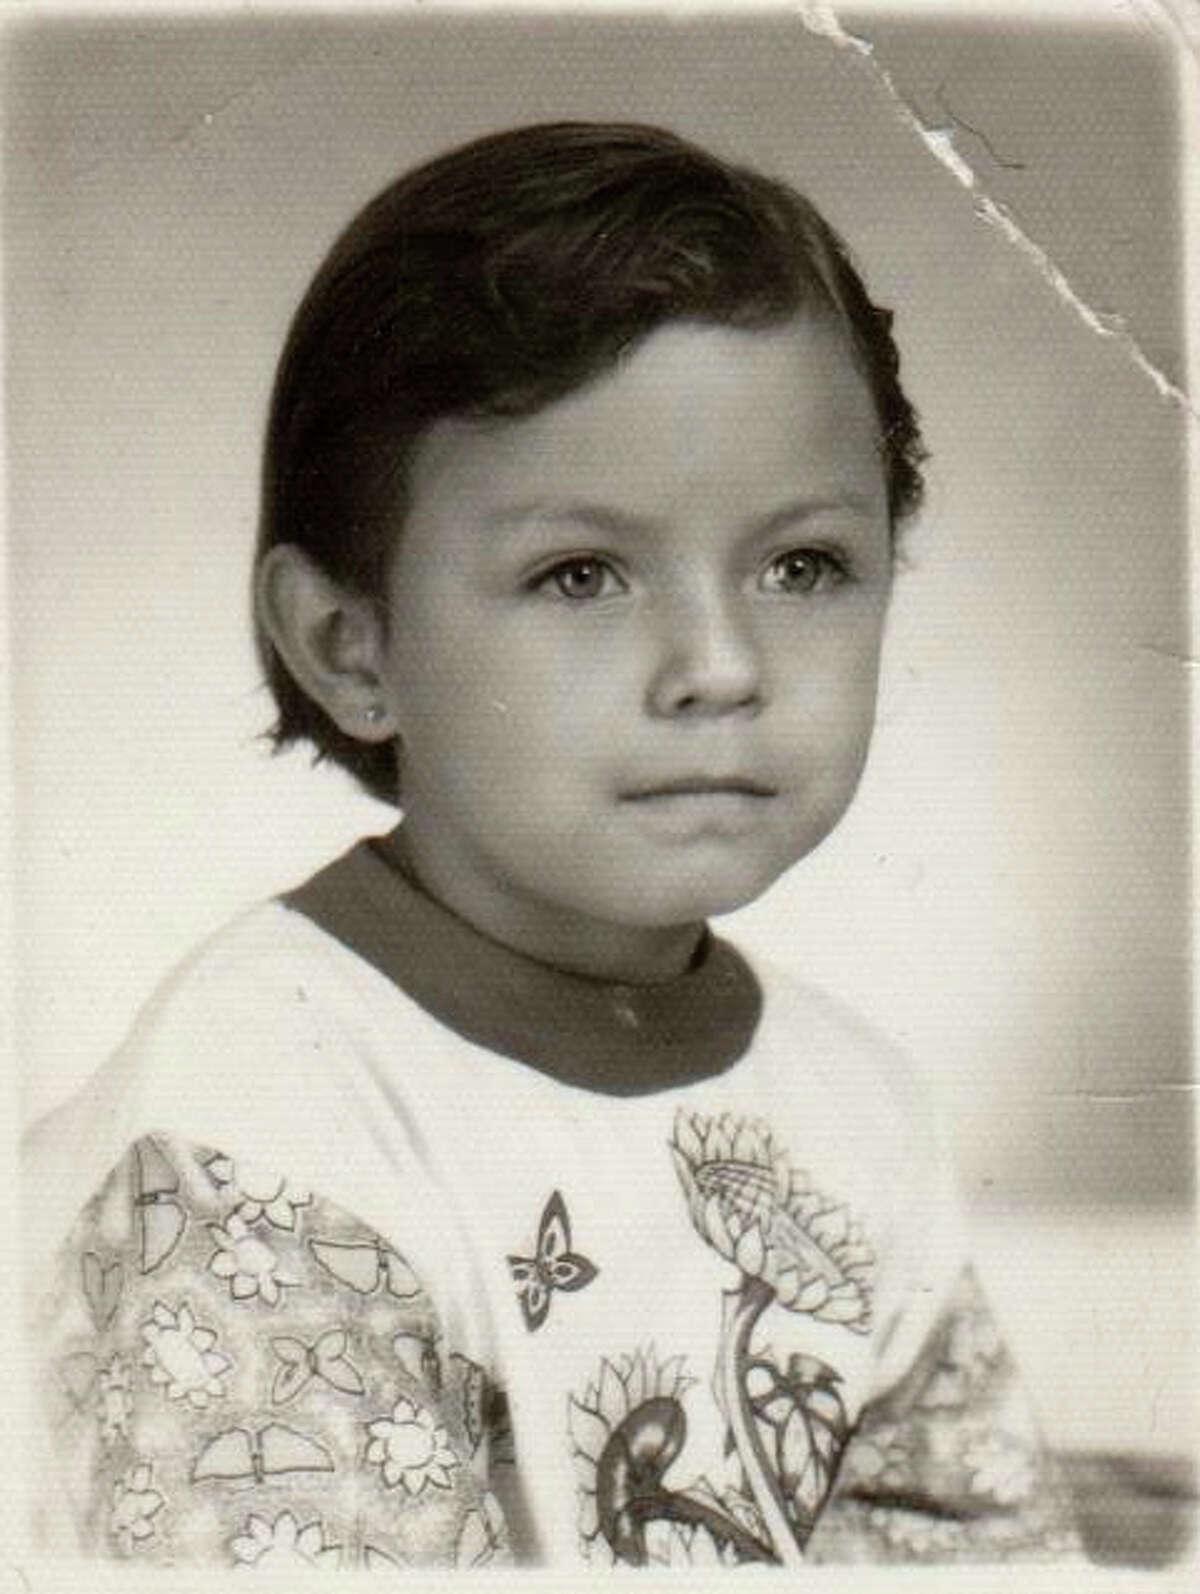 Claudia Maria Sarai Tujab at age 6 when she had her curative heart surgery in Guatamala.